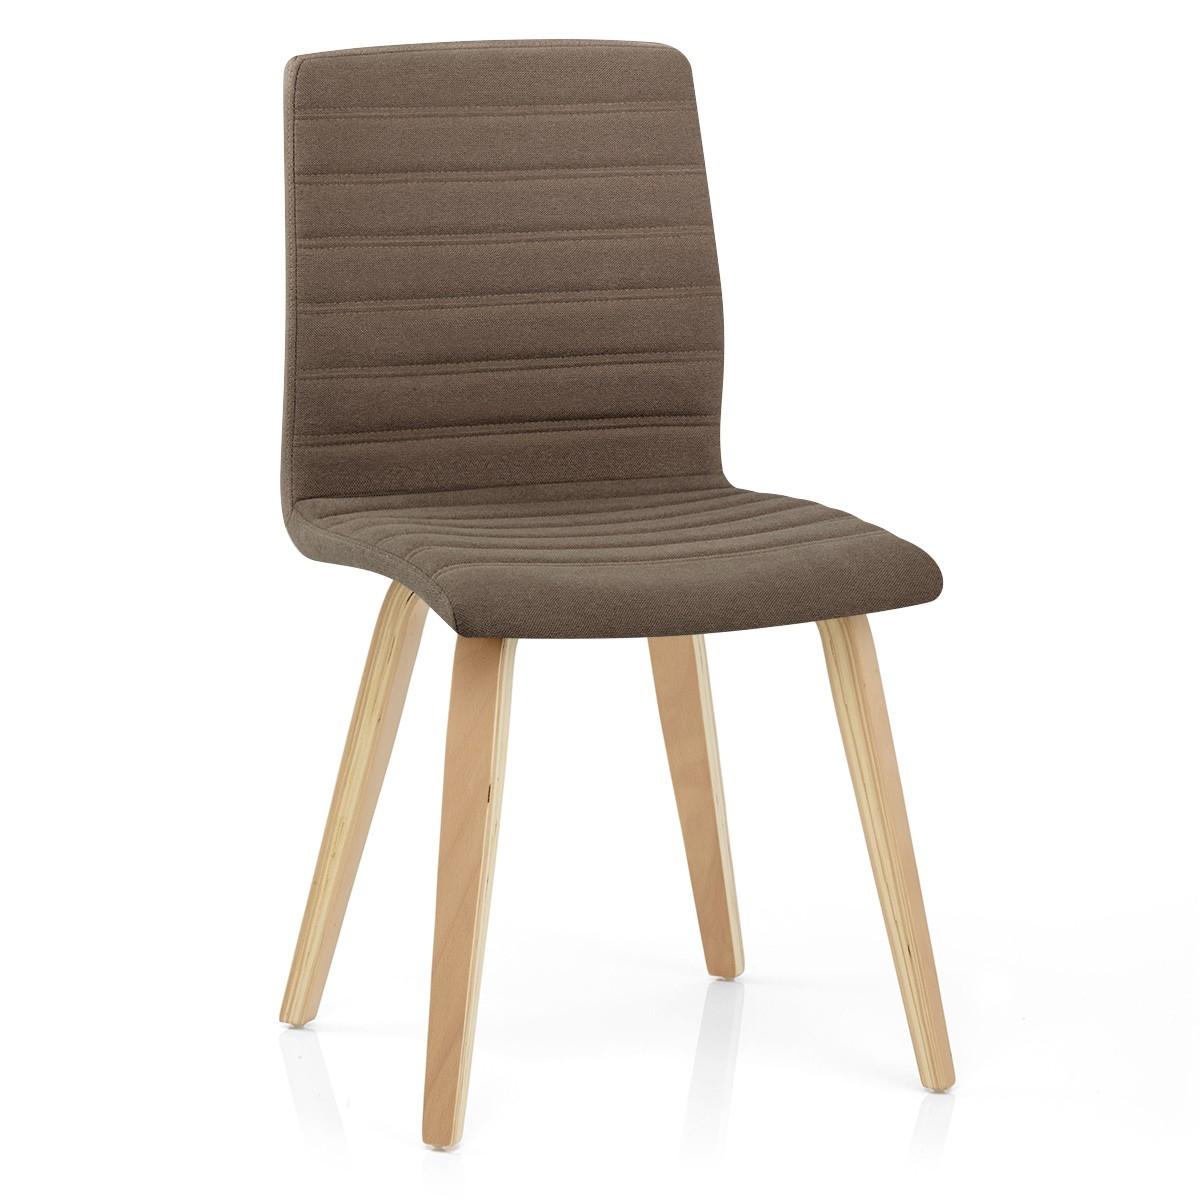 Chaises de diner, large gamme, ameublement, chaises salle à mager ...